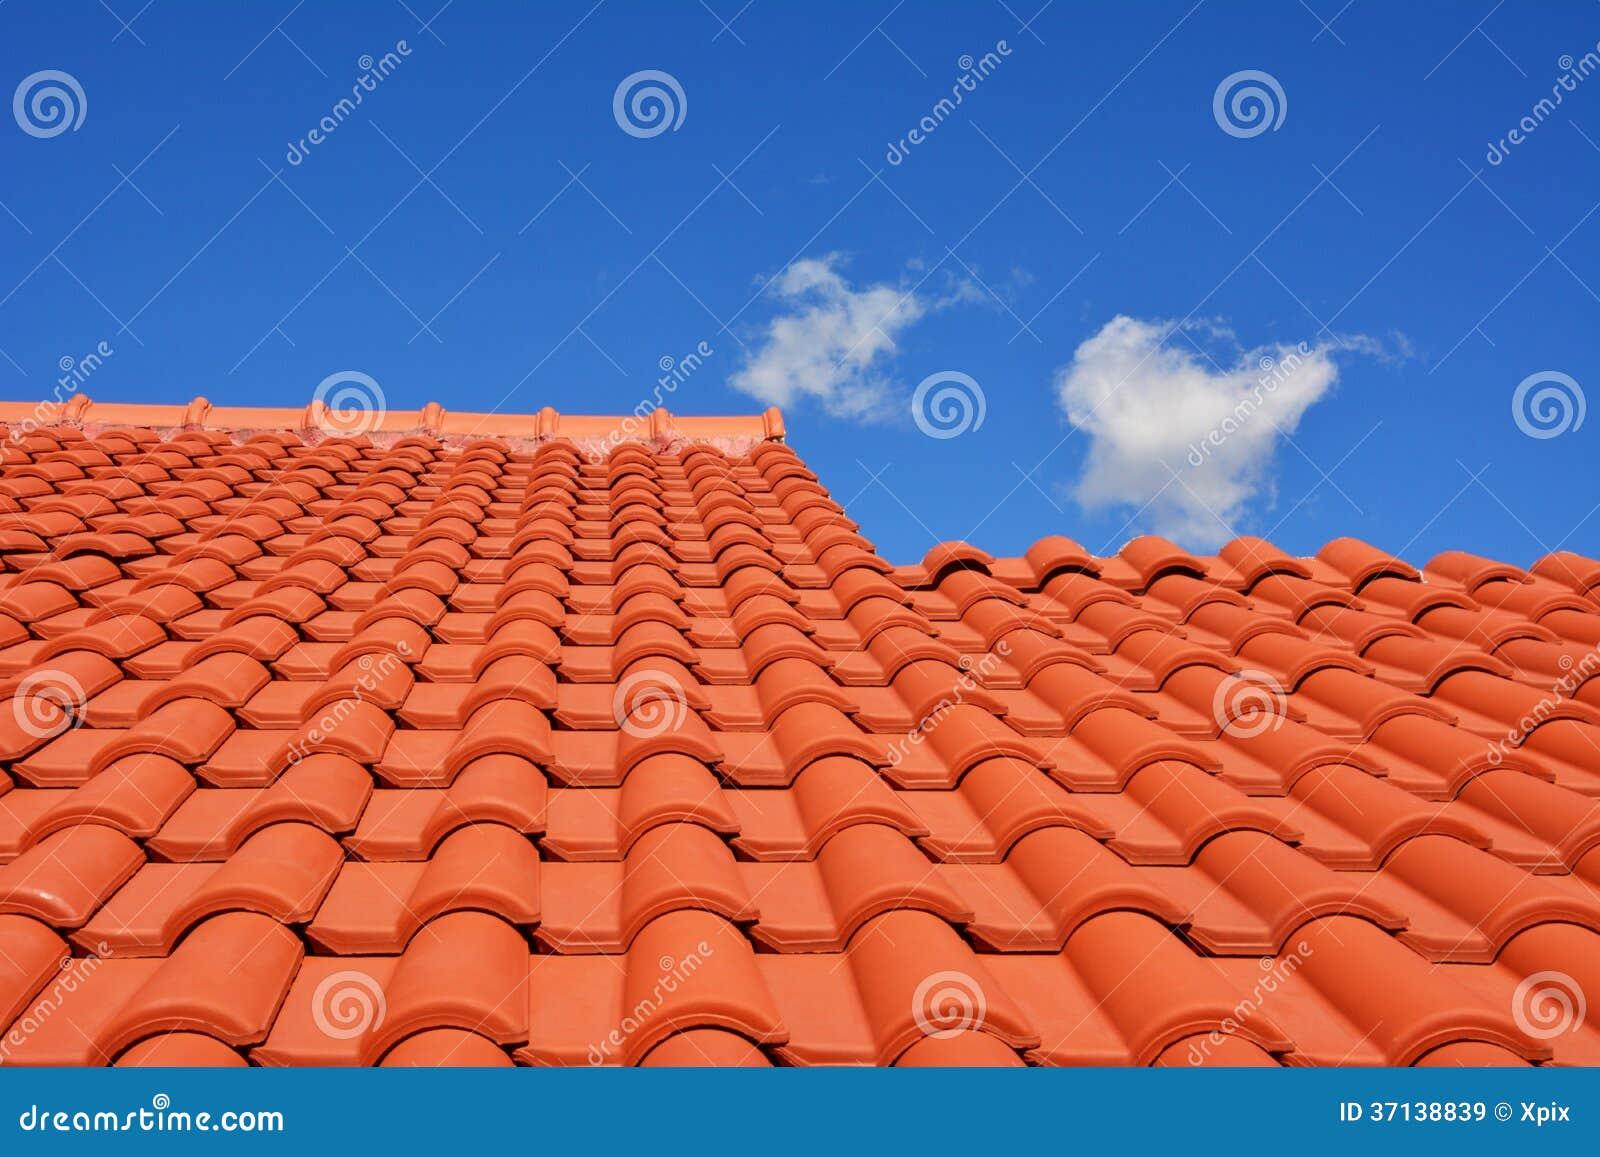 Teja roja de la textura del tejado